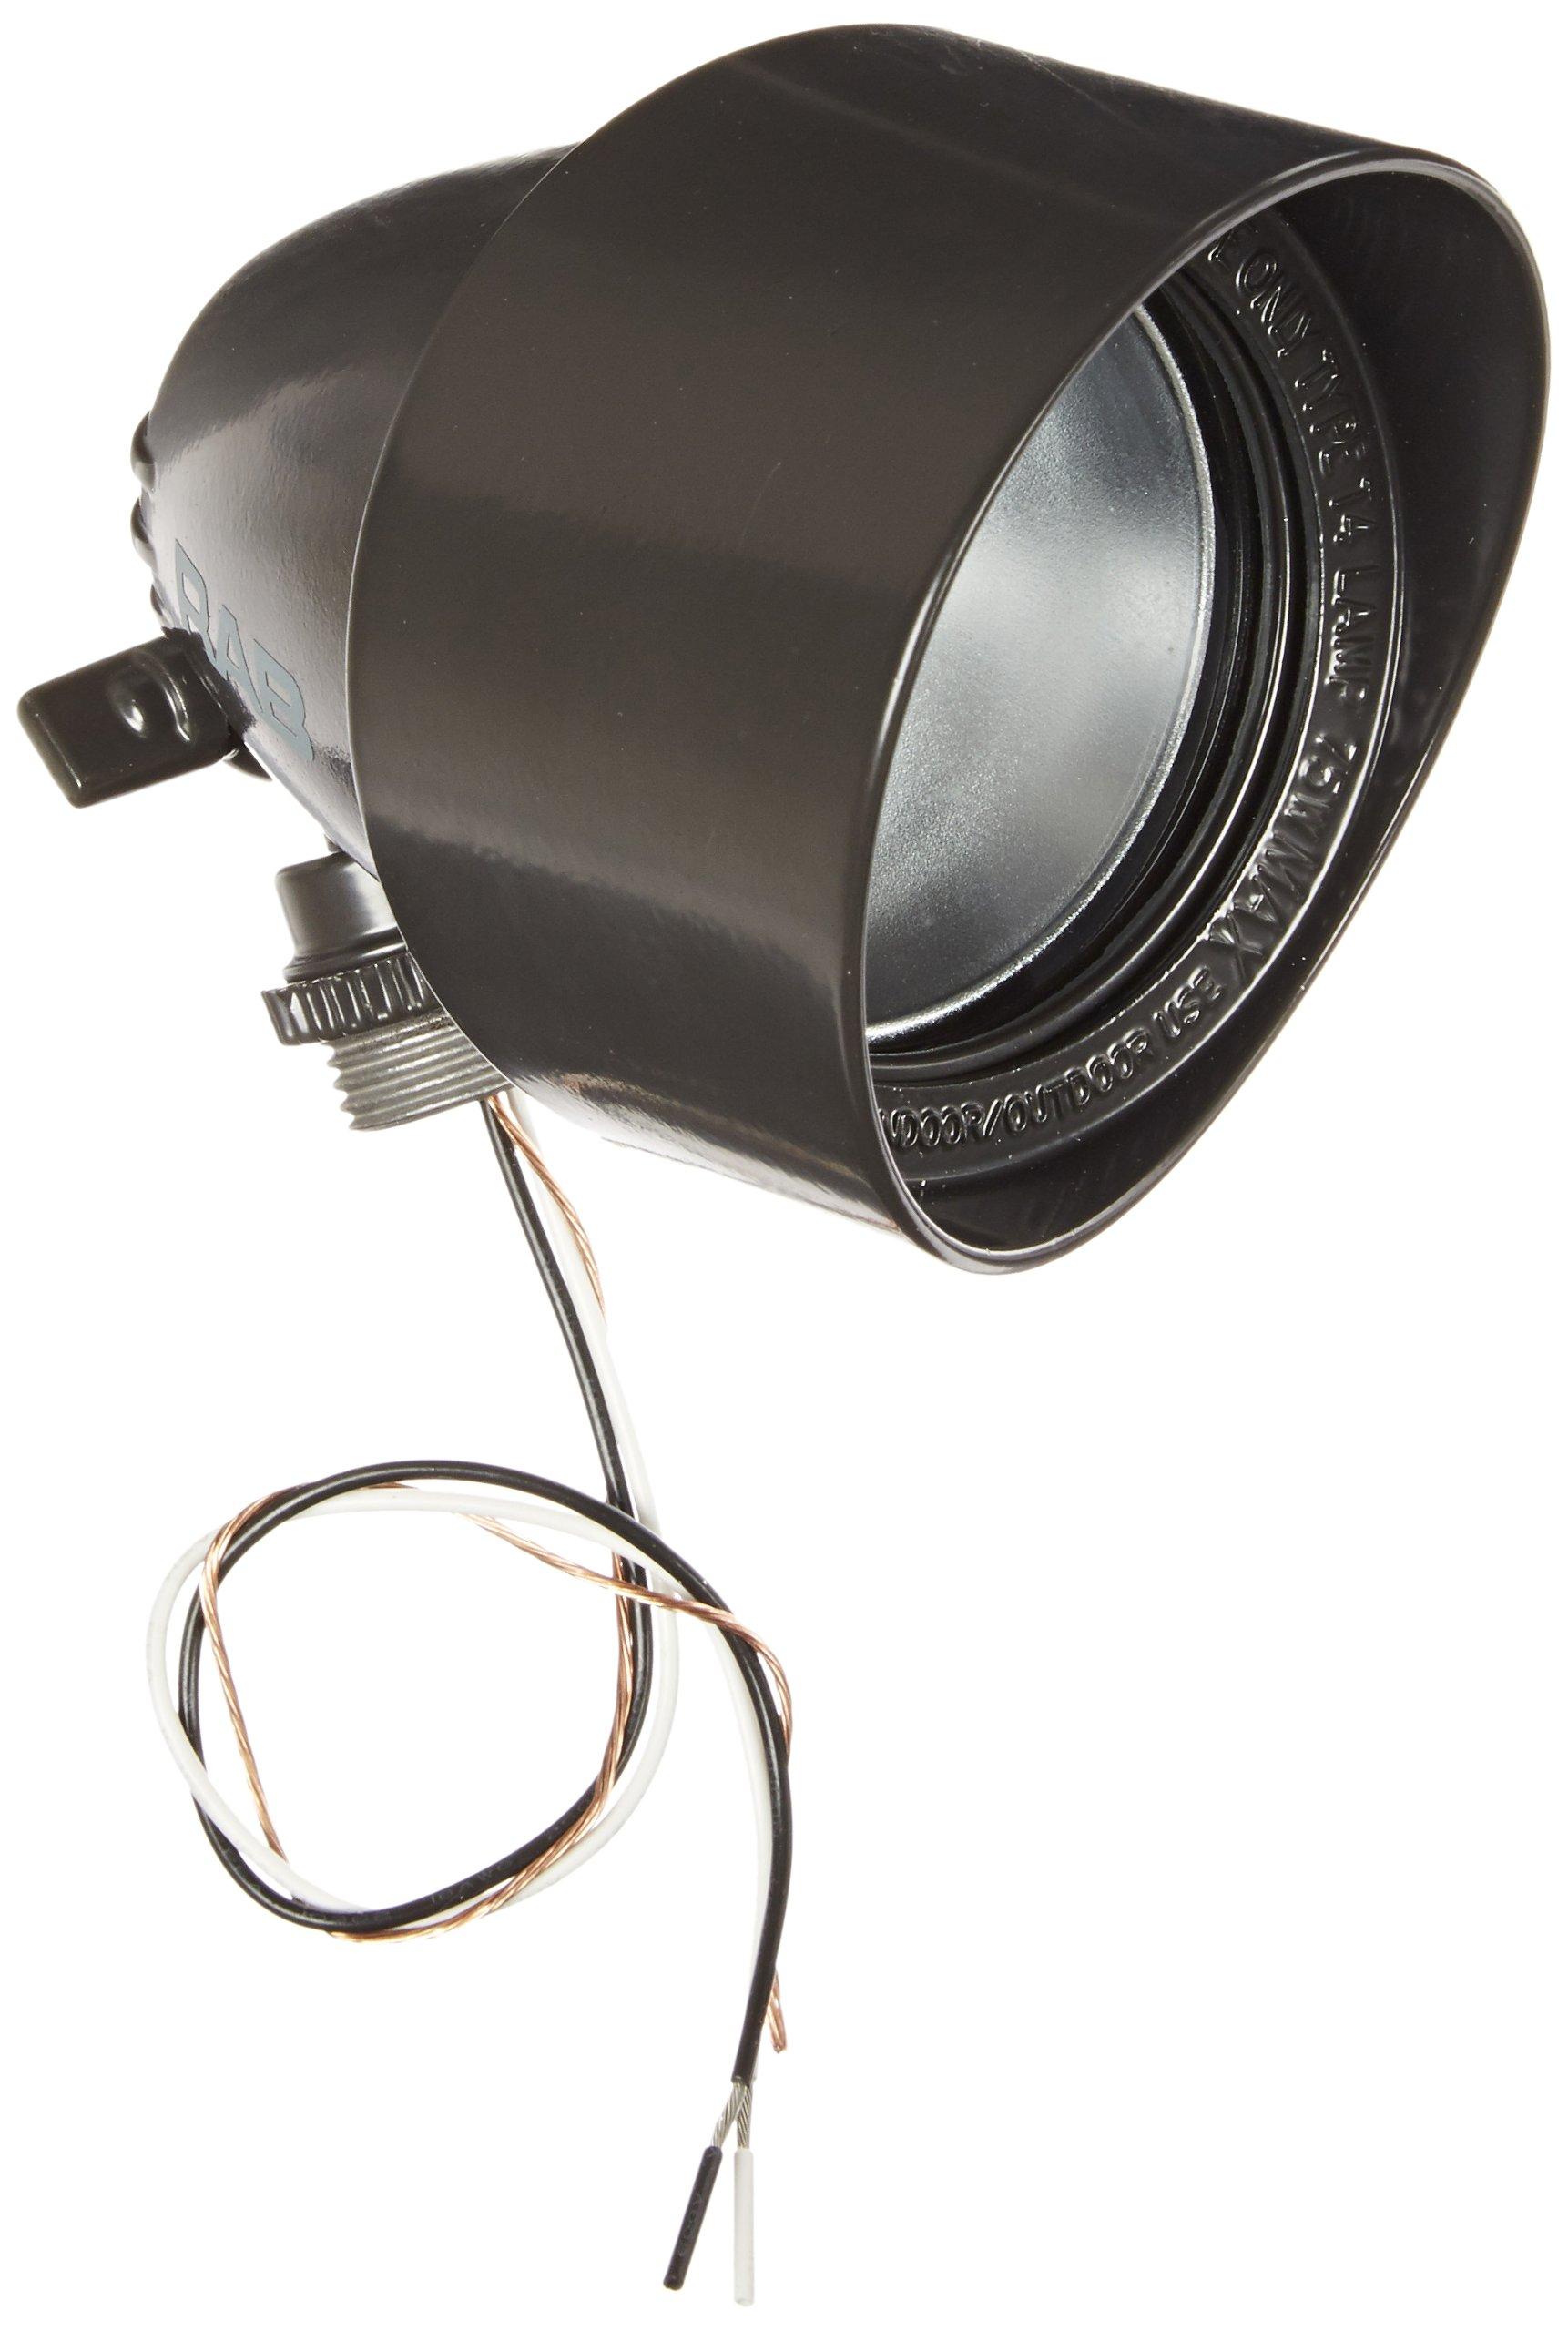 RAB Lighting QB1A Quartz Bullet Floodlight, Aluminum, 75W Power, 1500 Lumens, 127V, Bronze Color